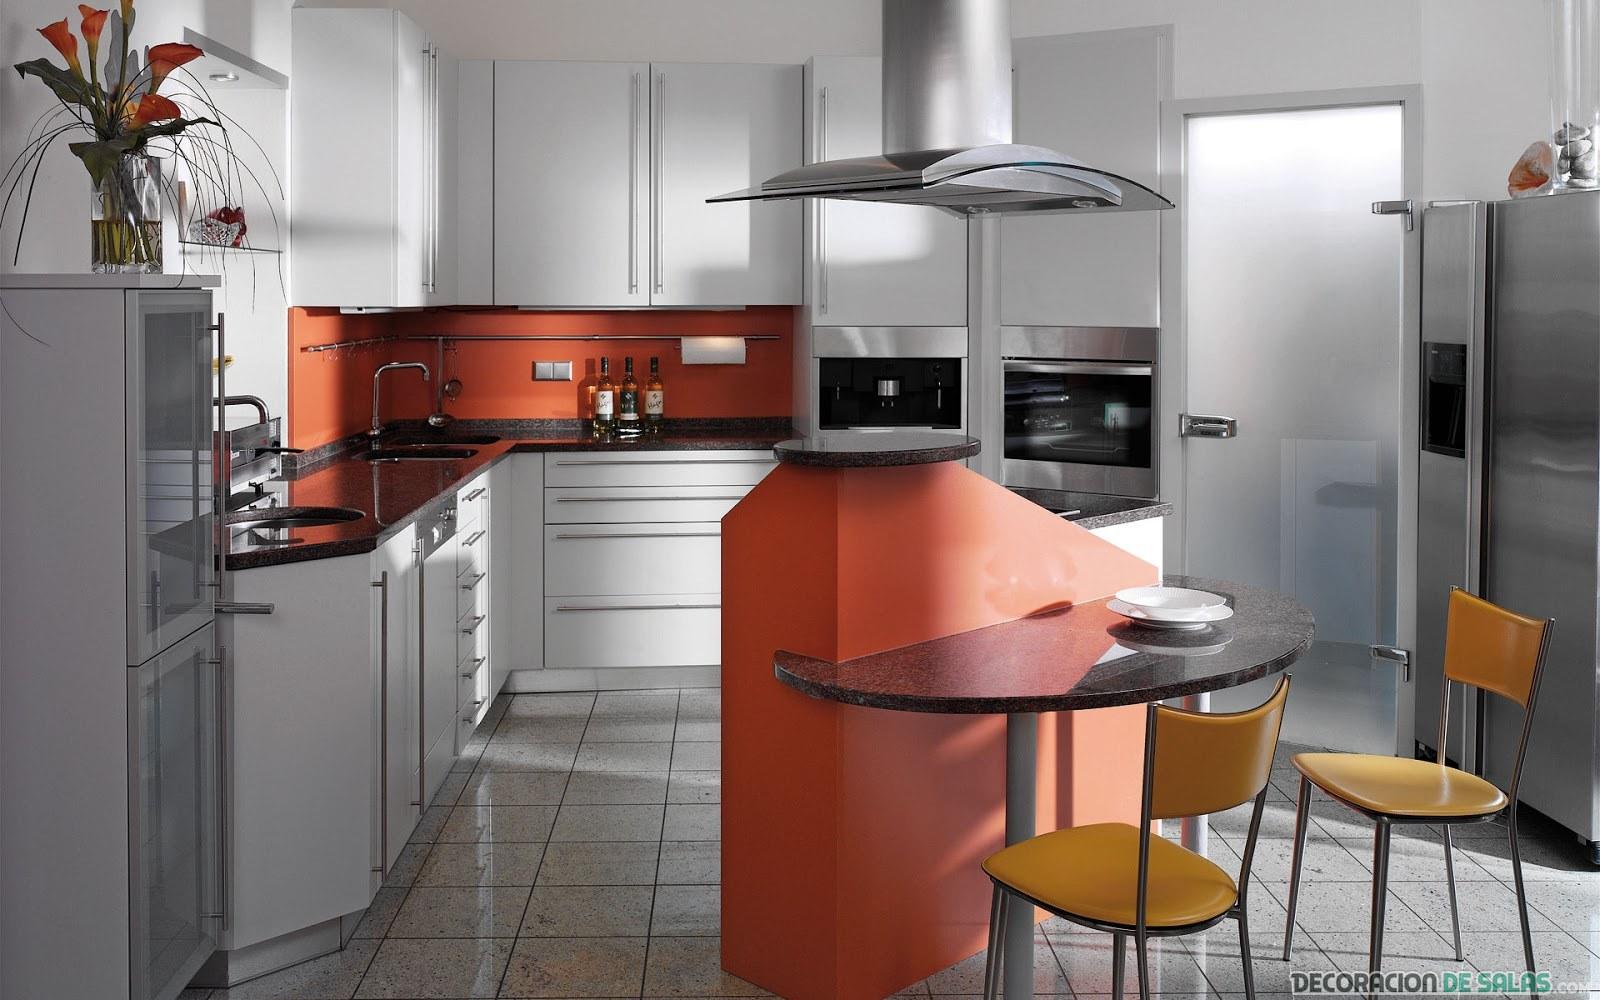 Genial mesas rinconeras de cocina galer a de im genes for Mesas rinconeras de cocina de madera